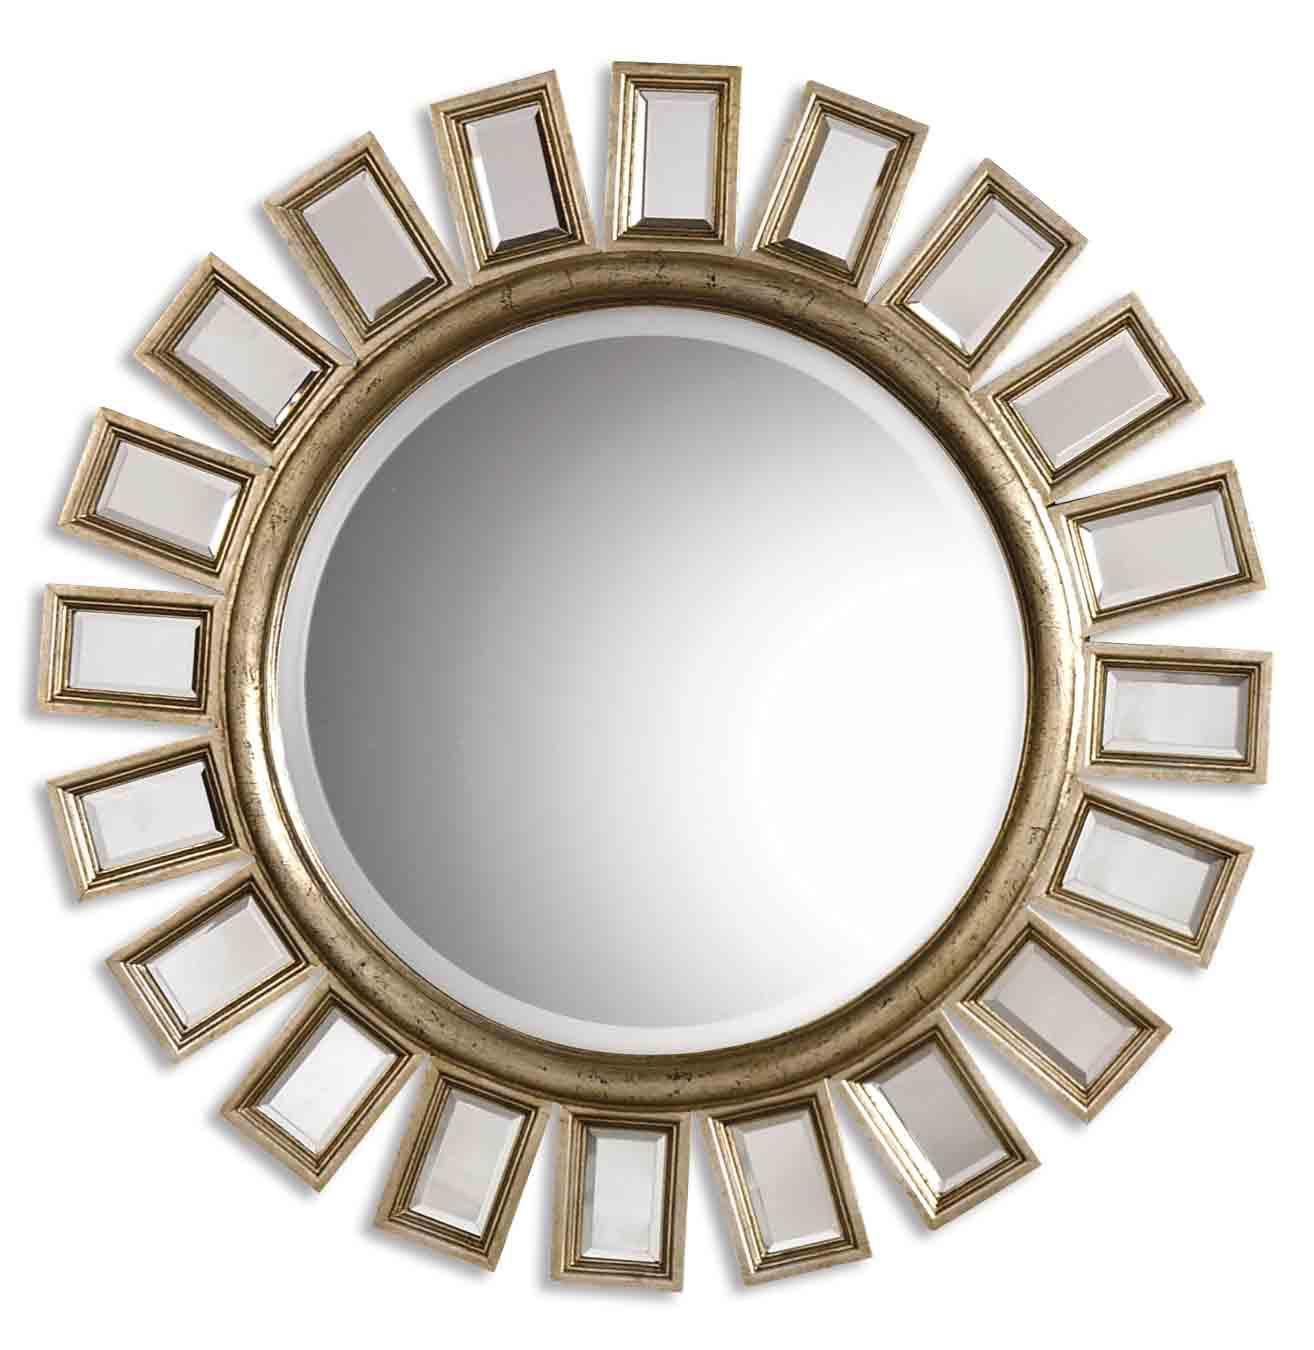 Uttermost Mirrors Cyrus - Item Number: 14076 B